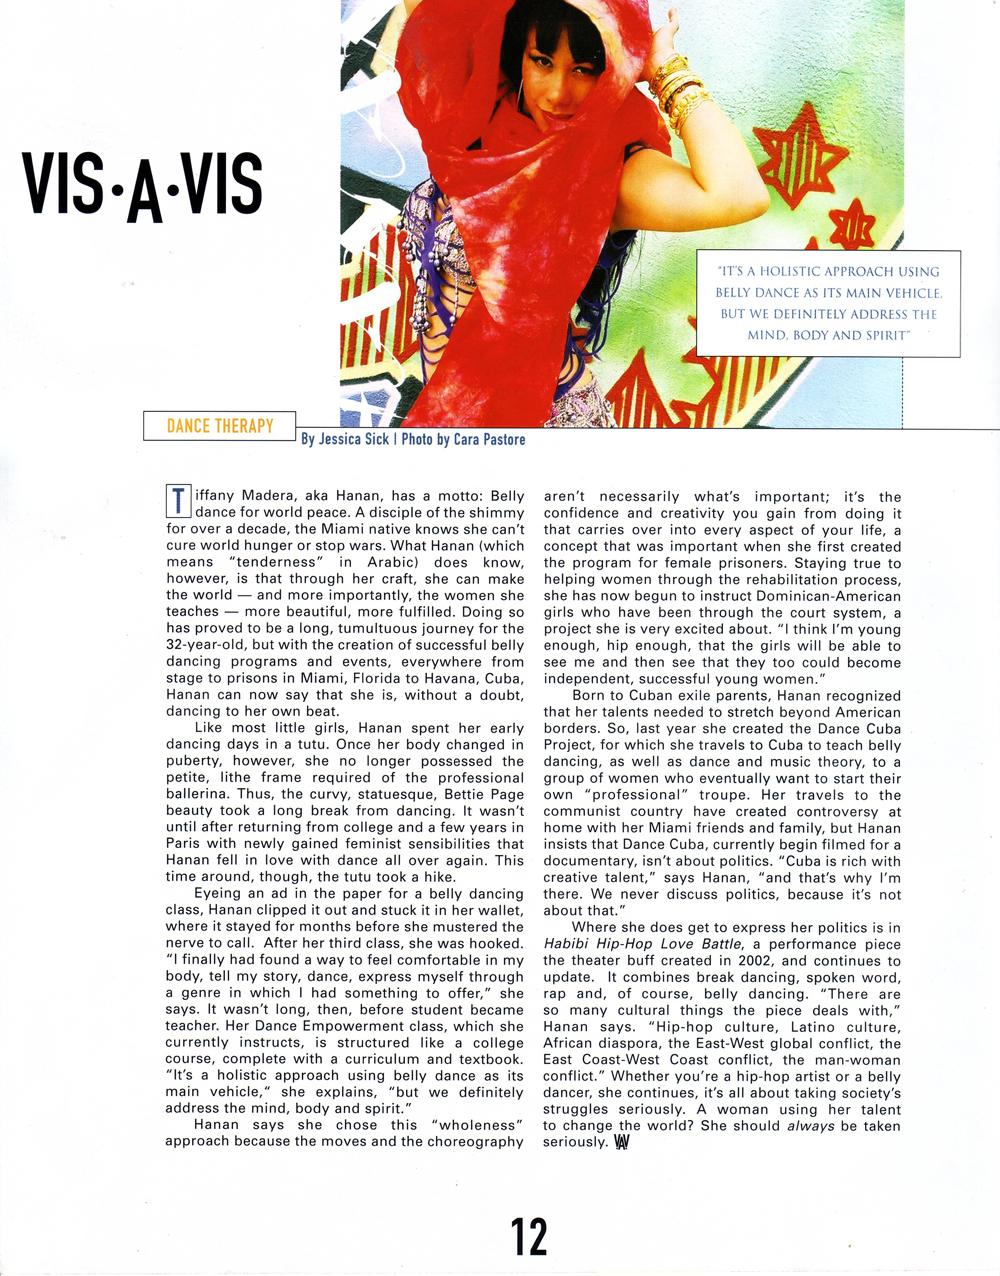 visavisarticle-backweb.jpg